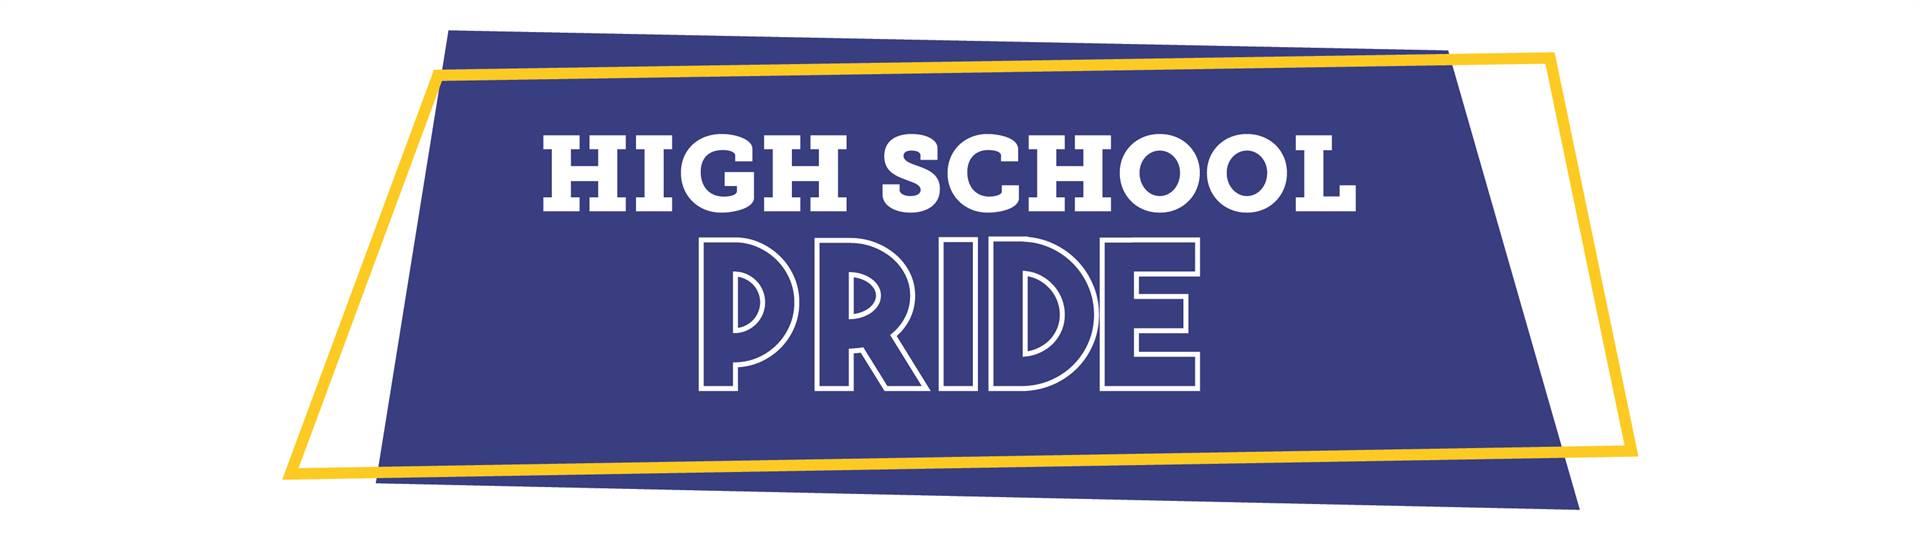 High School Pride